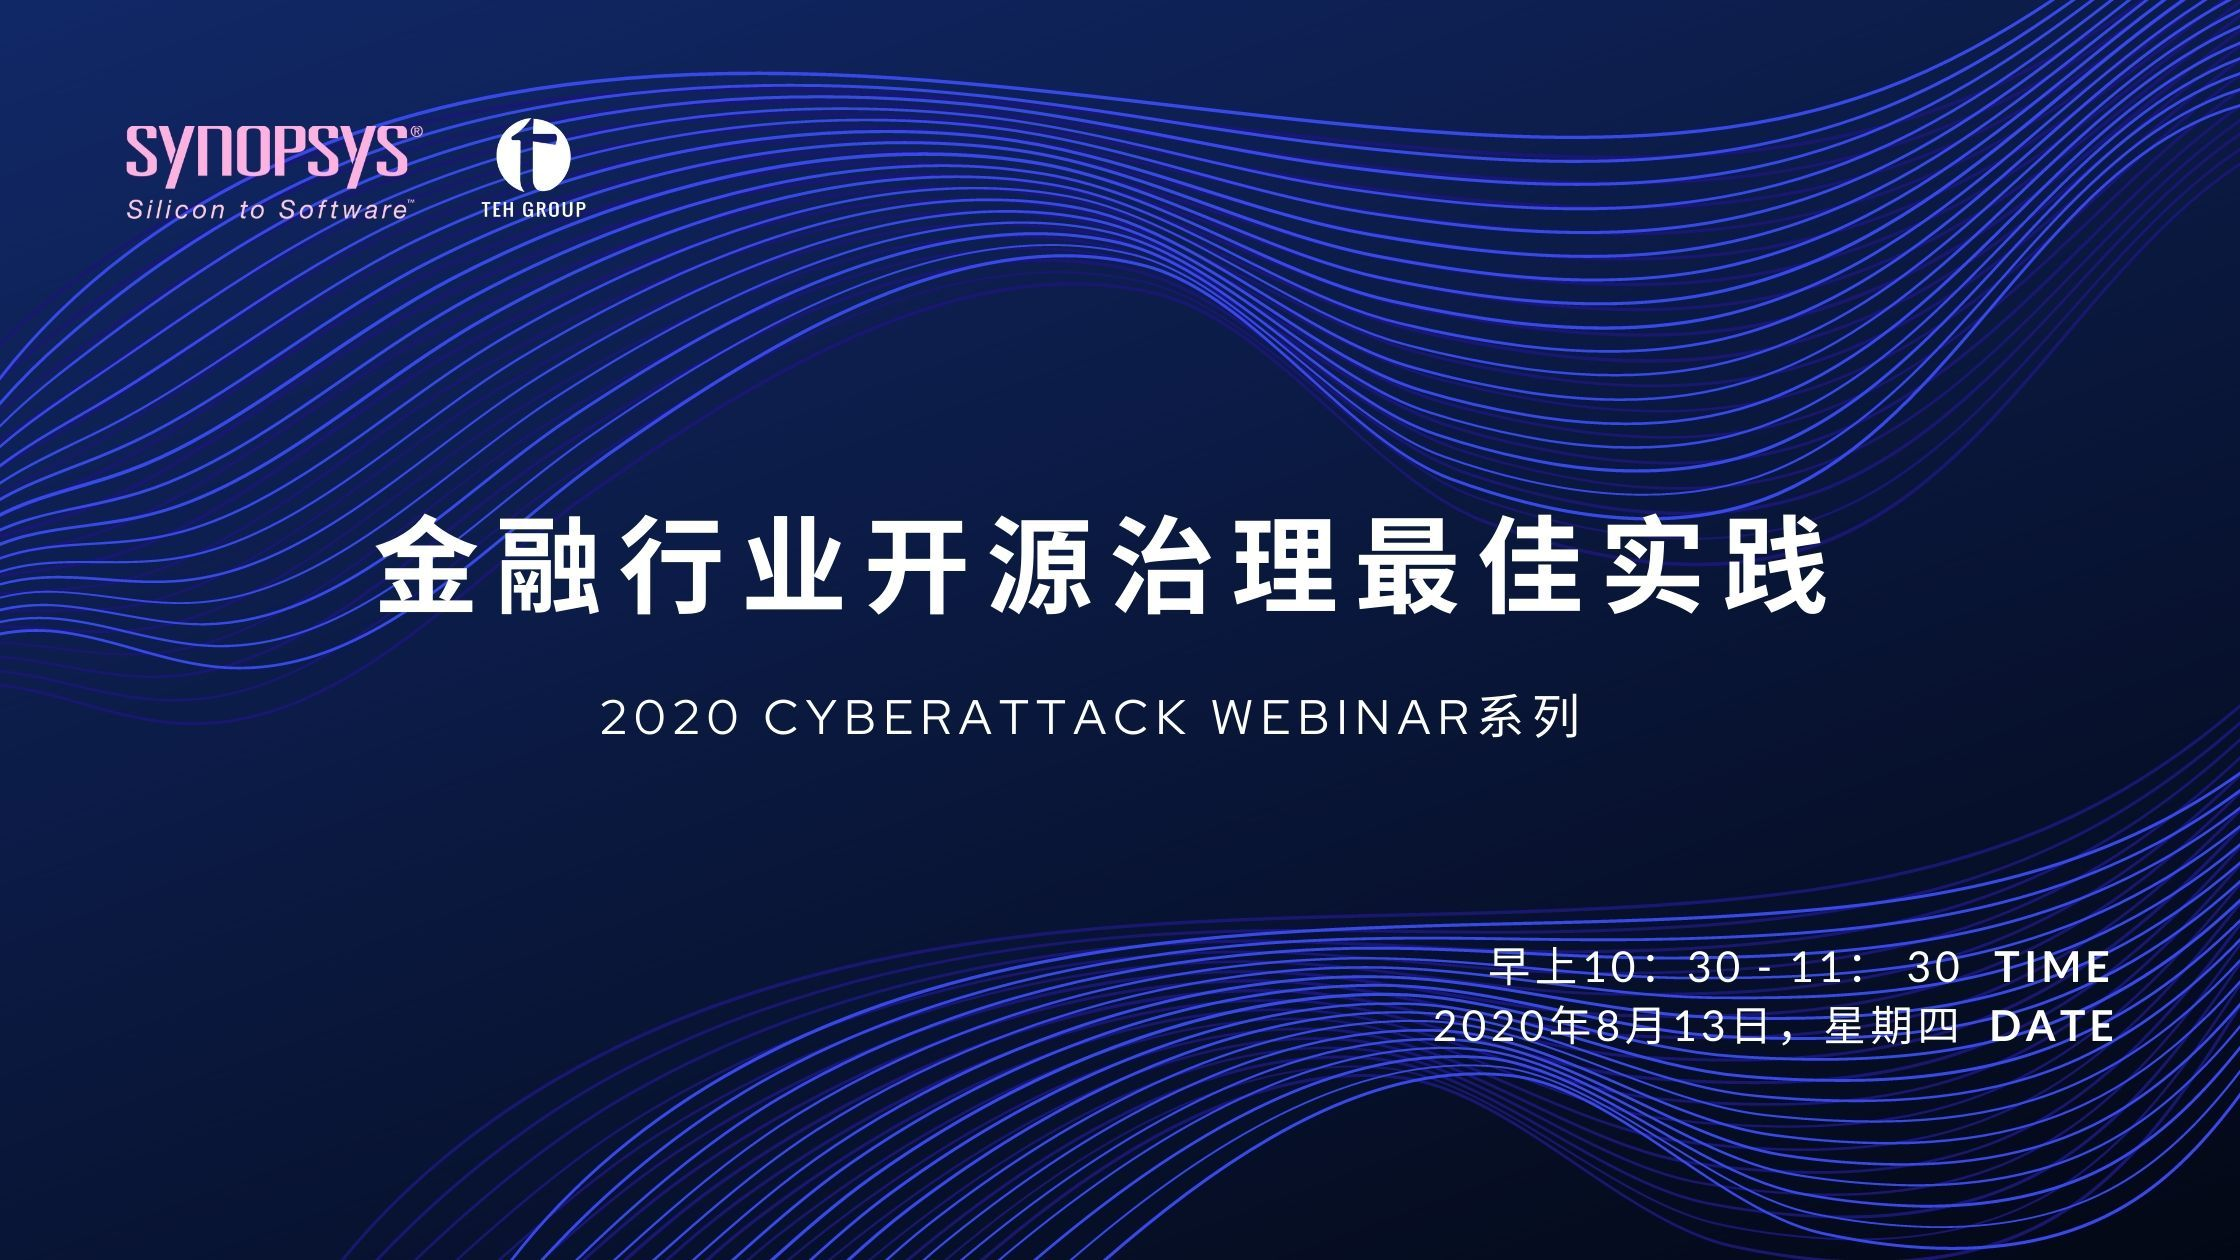 2020 CYBERATTACK 应用安全系列-金融行业开源治理最佳实践